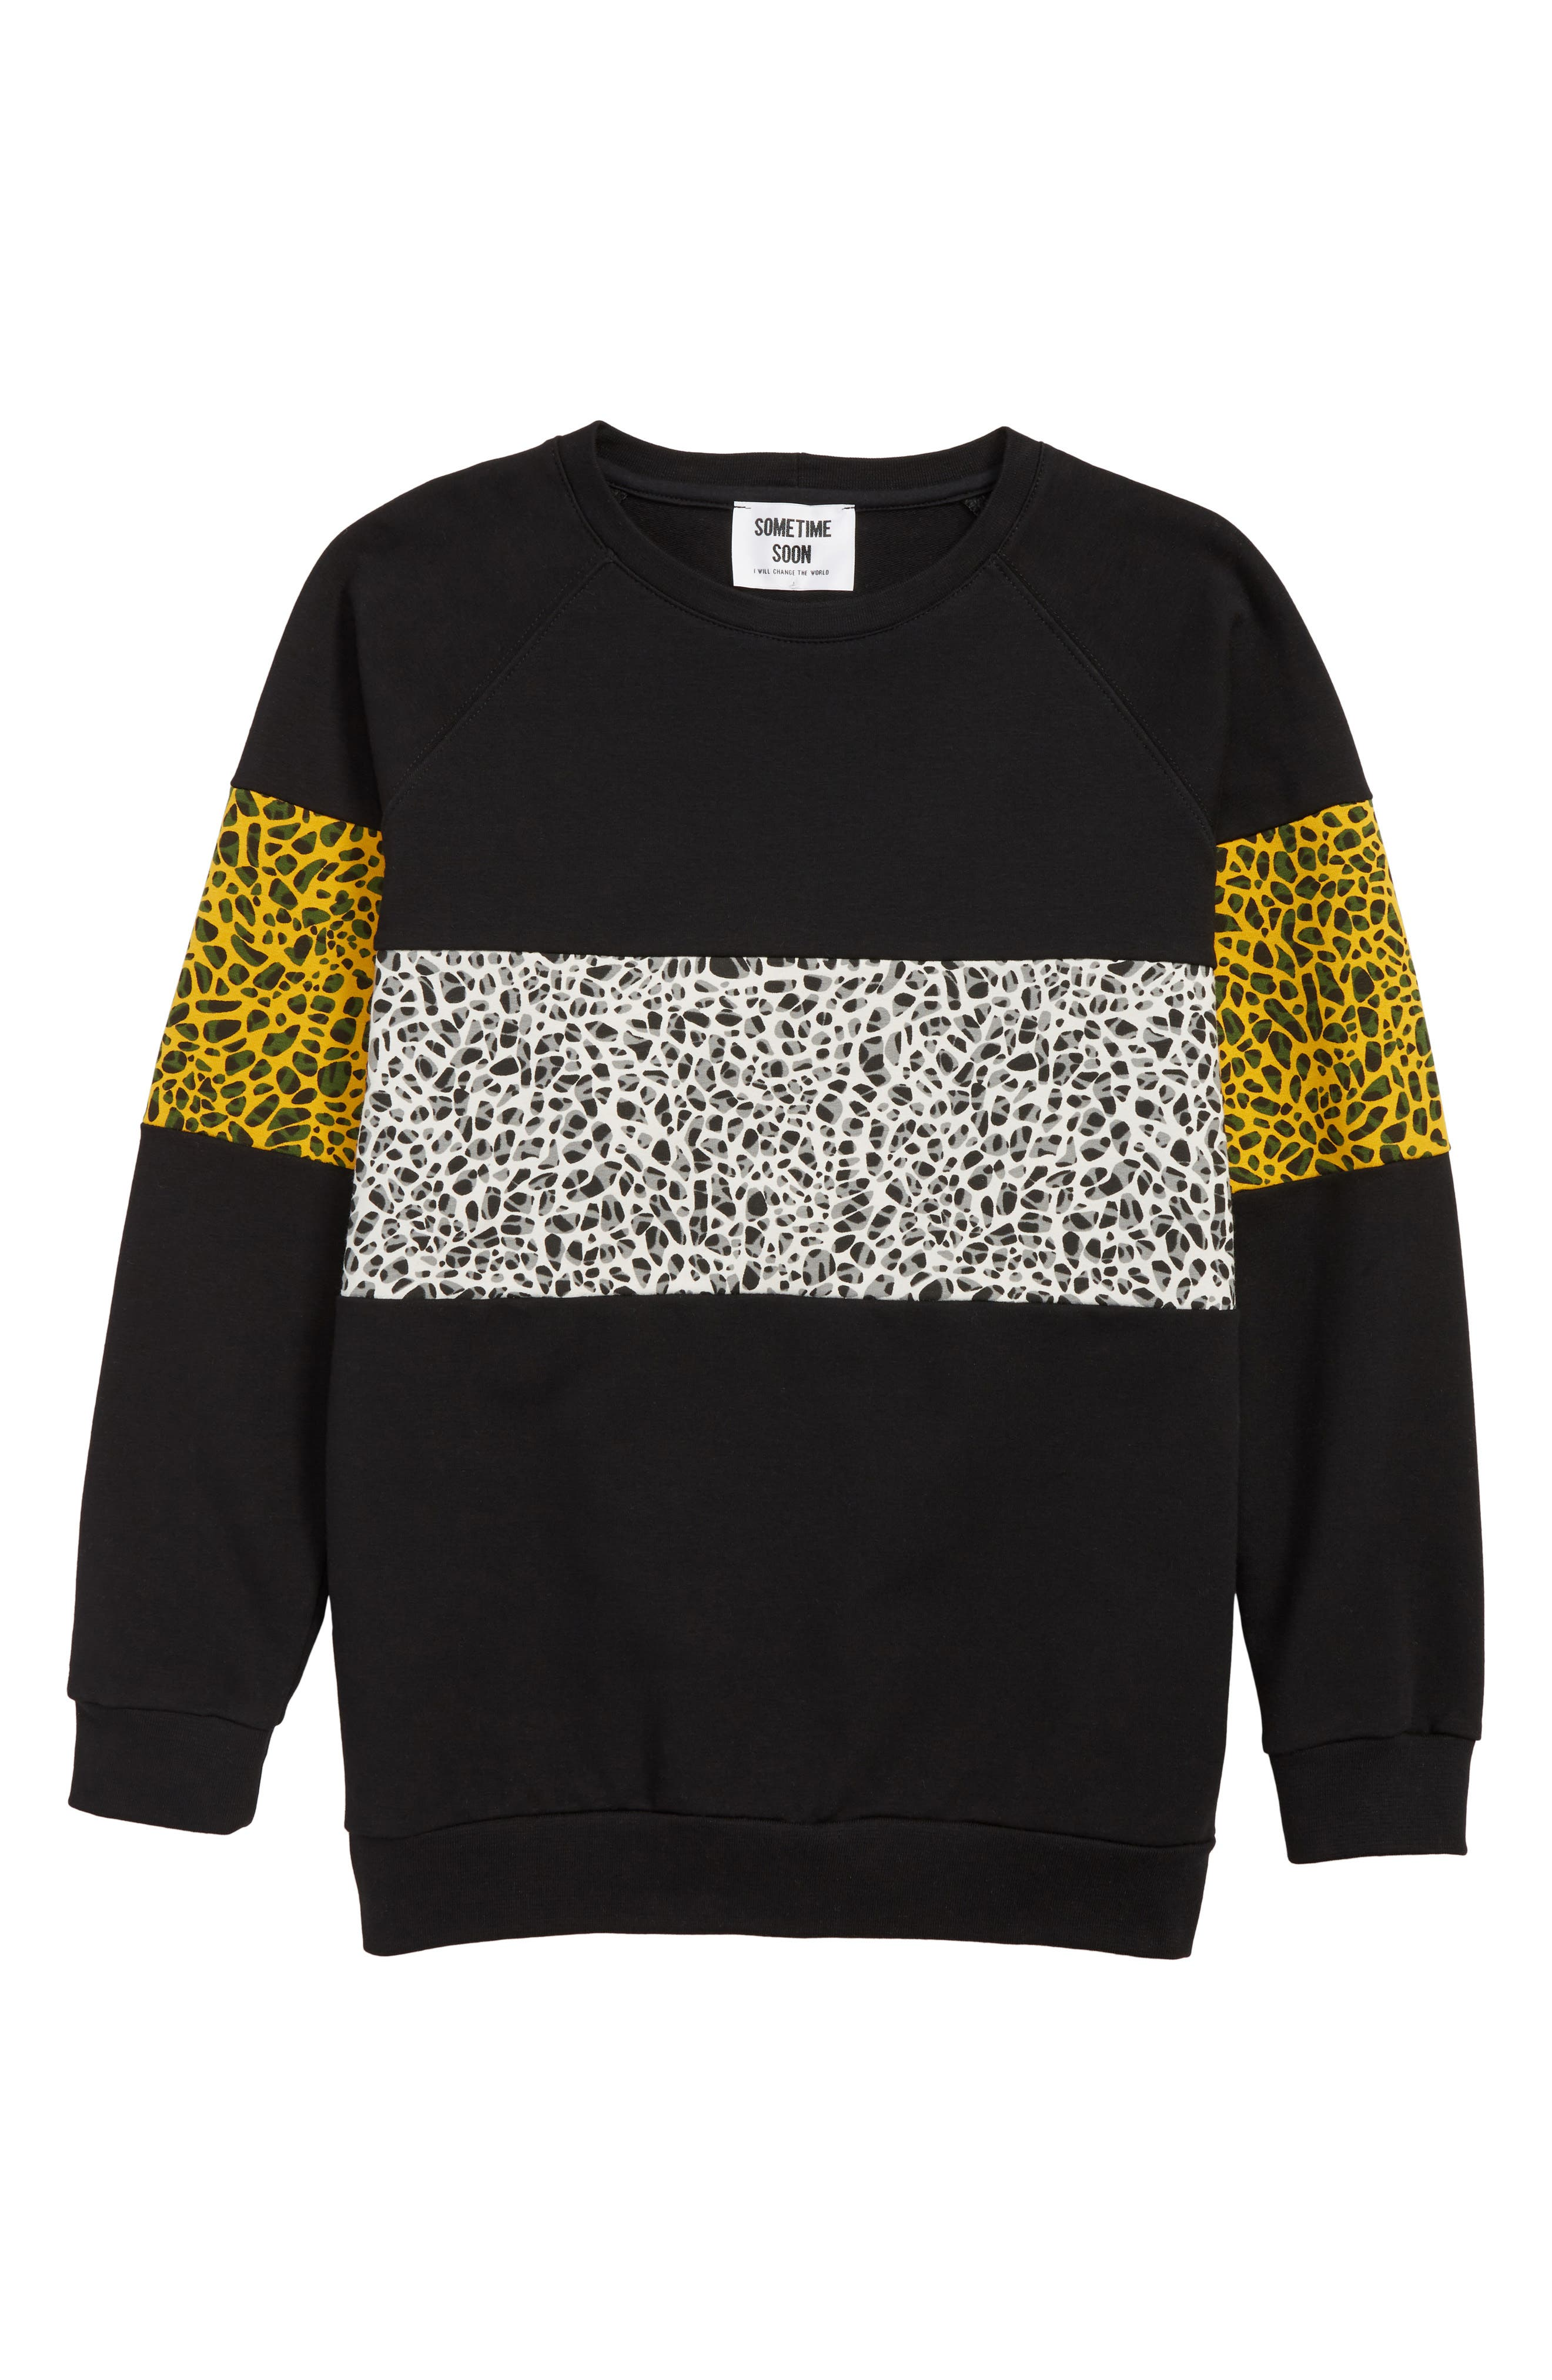 SOMETIME SOON Delano Organic Cotton Sweatshirt, Main, color, BLACK